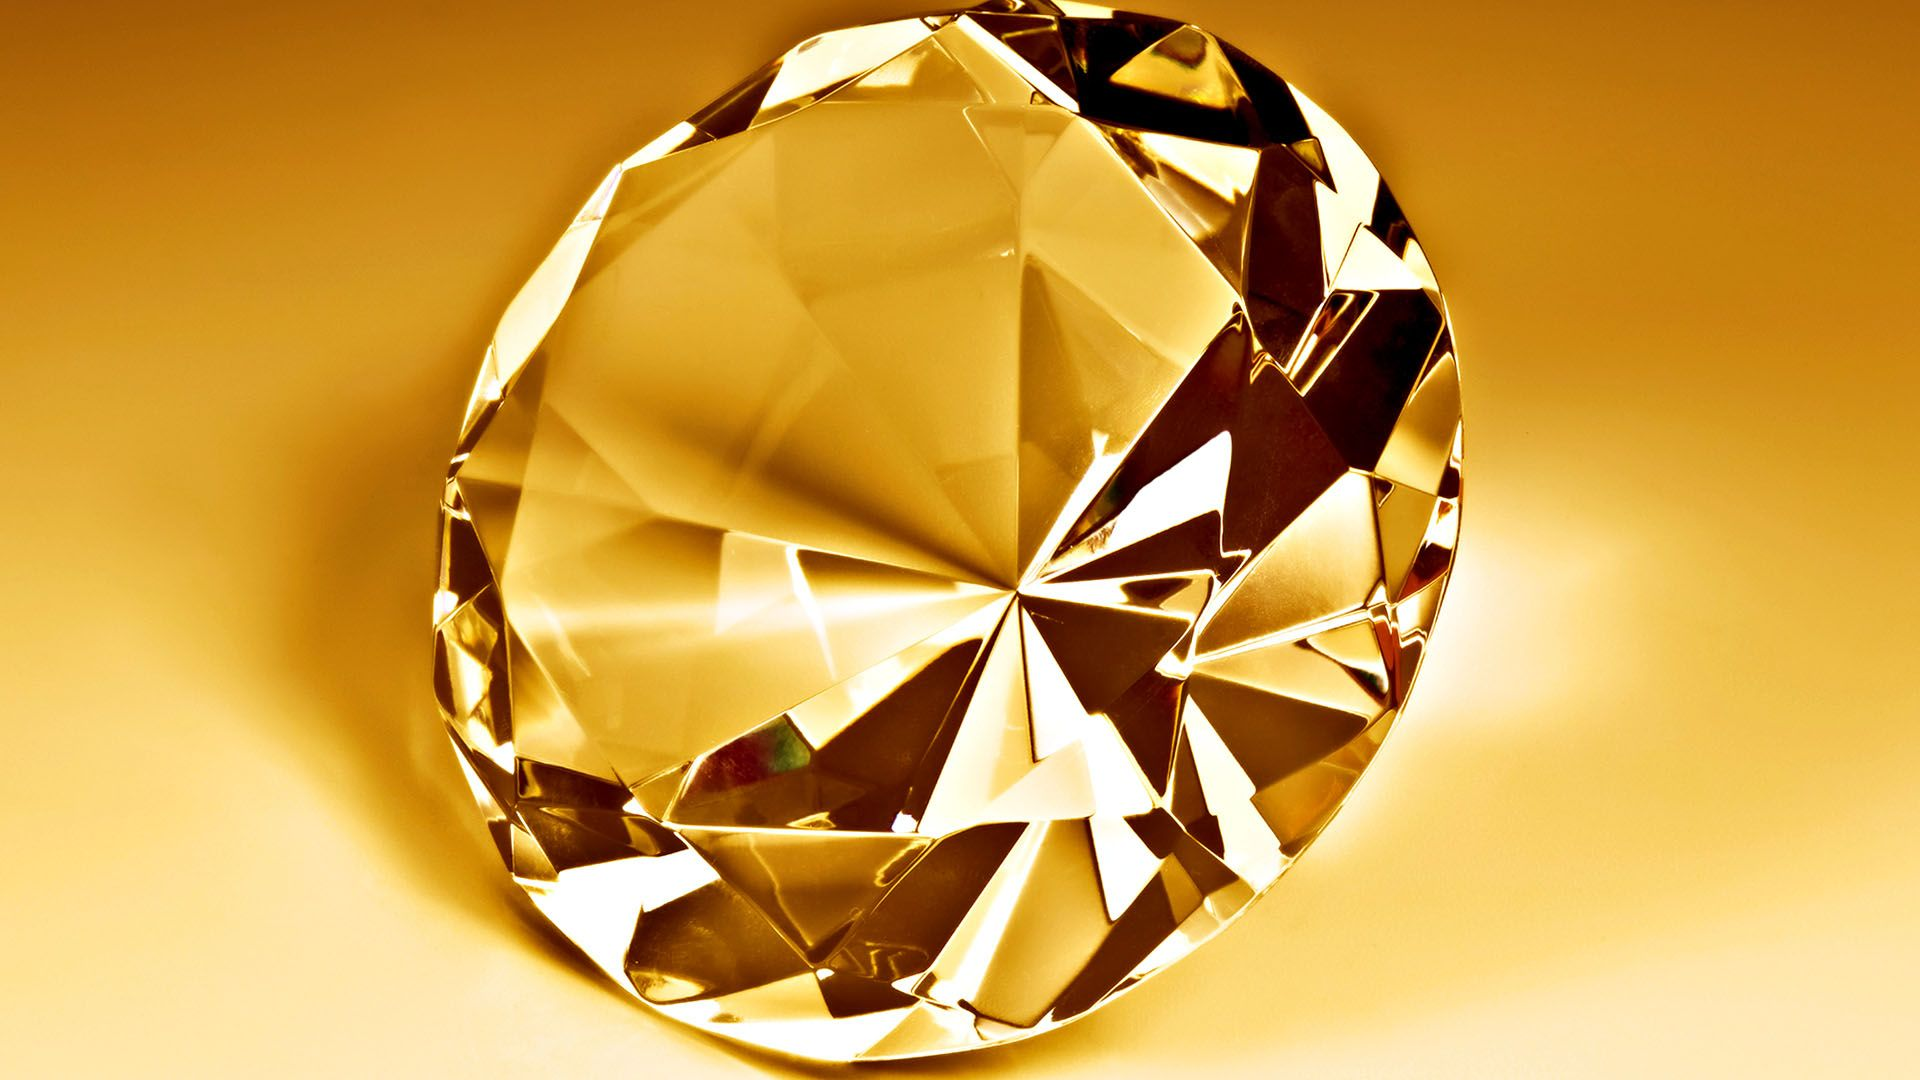 3d Diamond Gold Wallpapers Hd Desktop And Mobile Backgrounds Diamond Photography Gold Wallpaper Hd Diamond Wallpaper